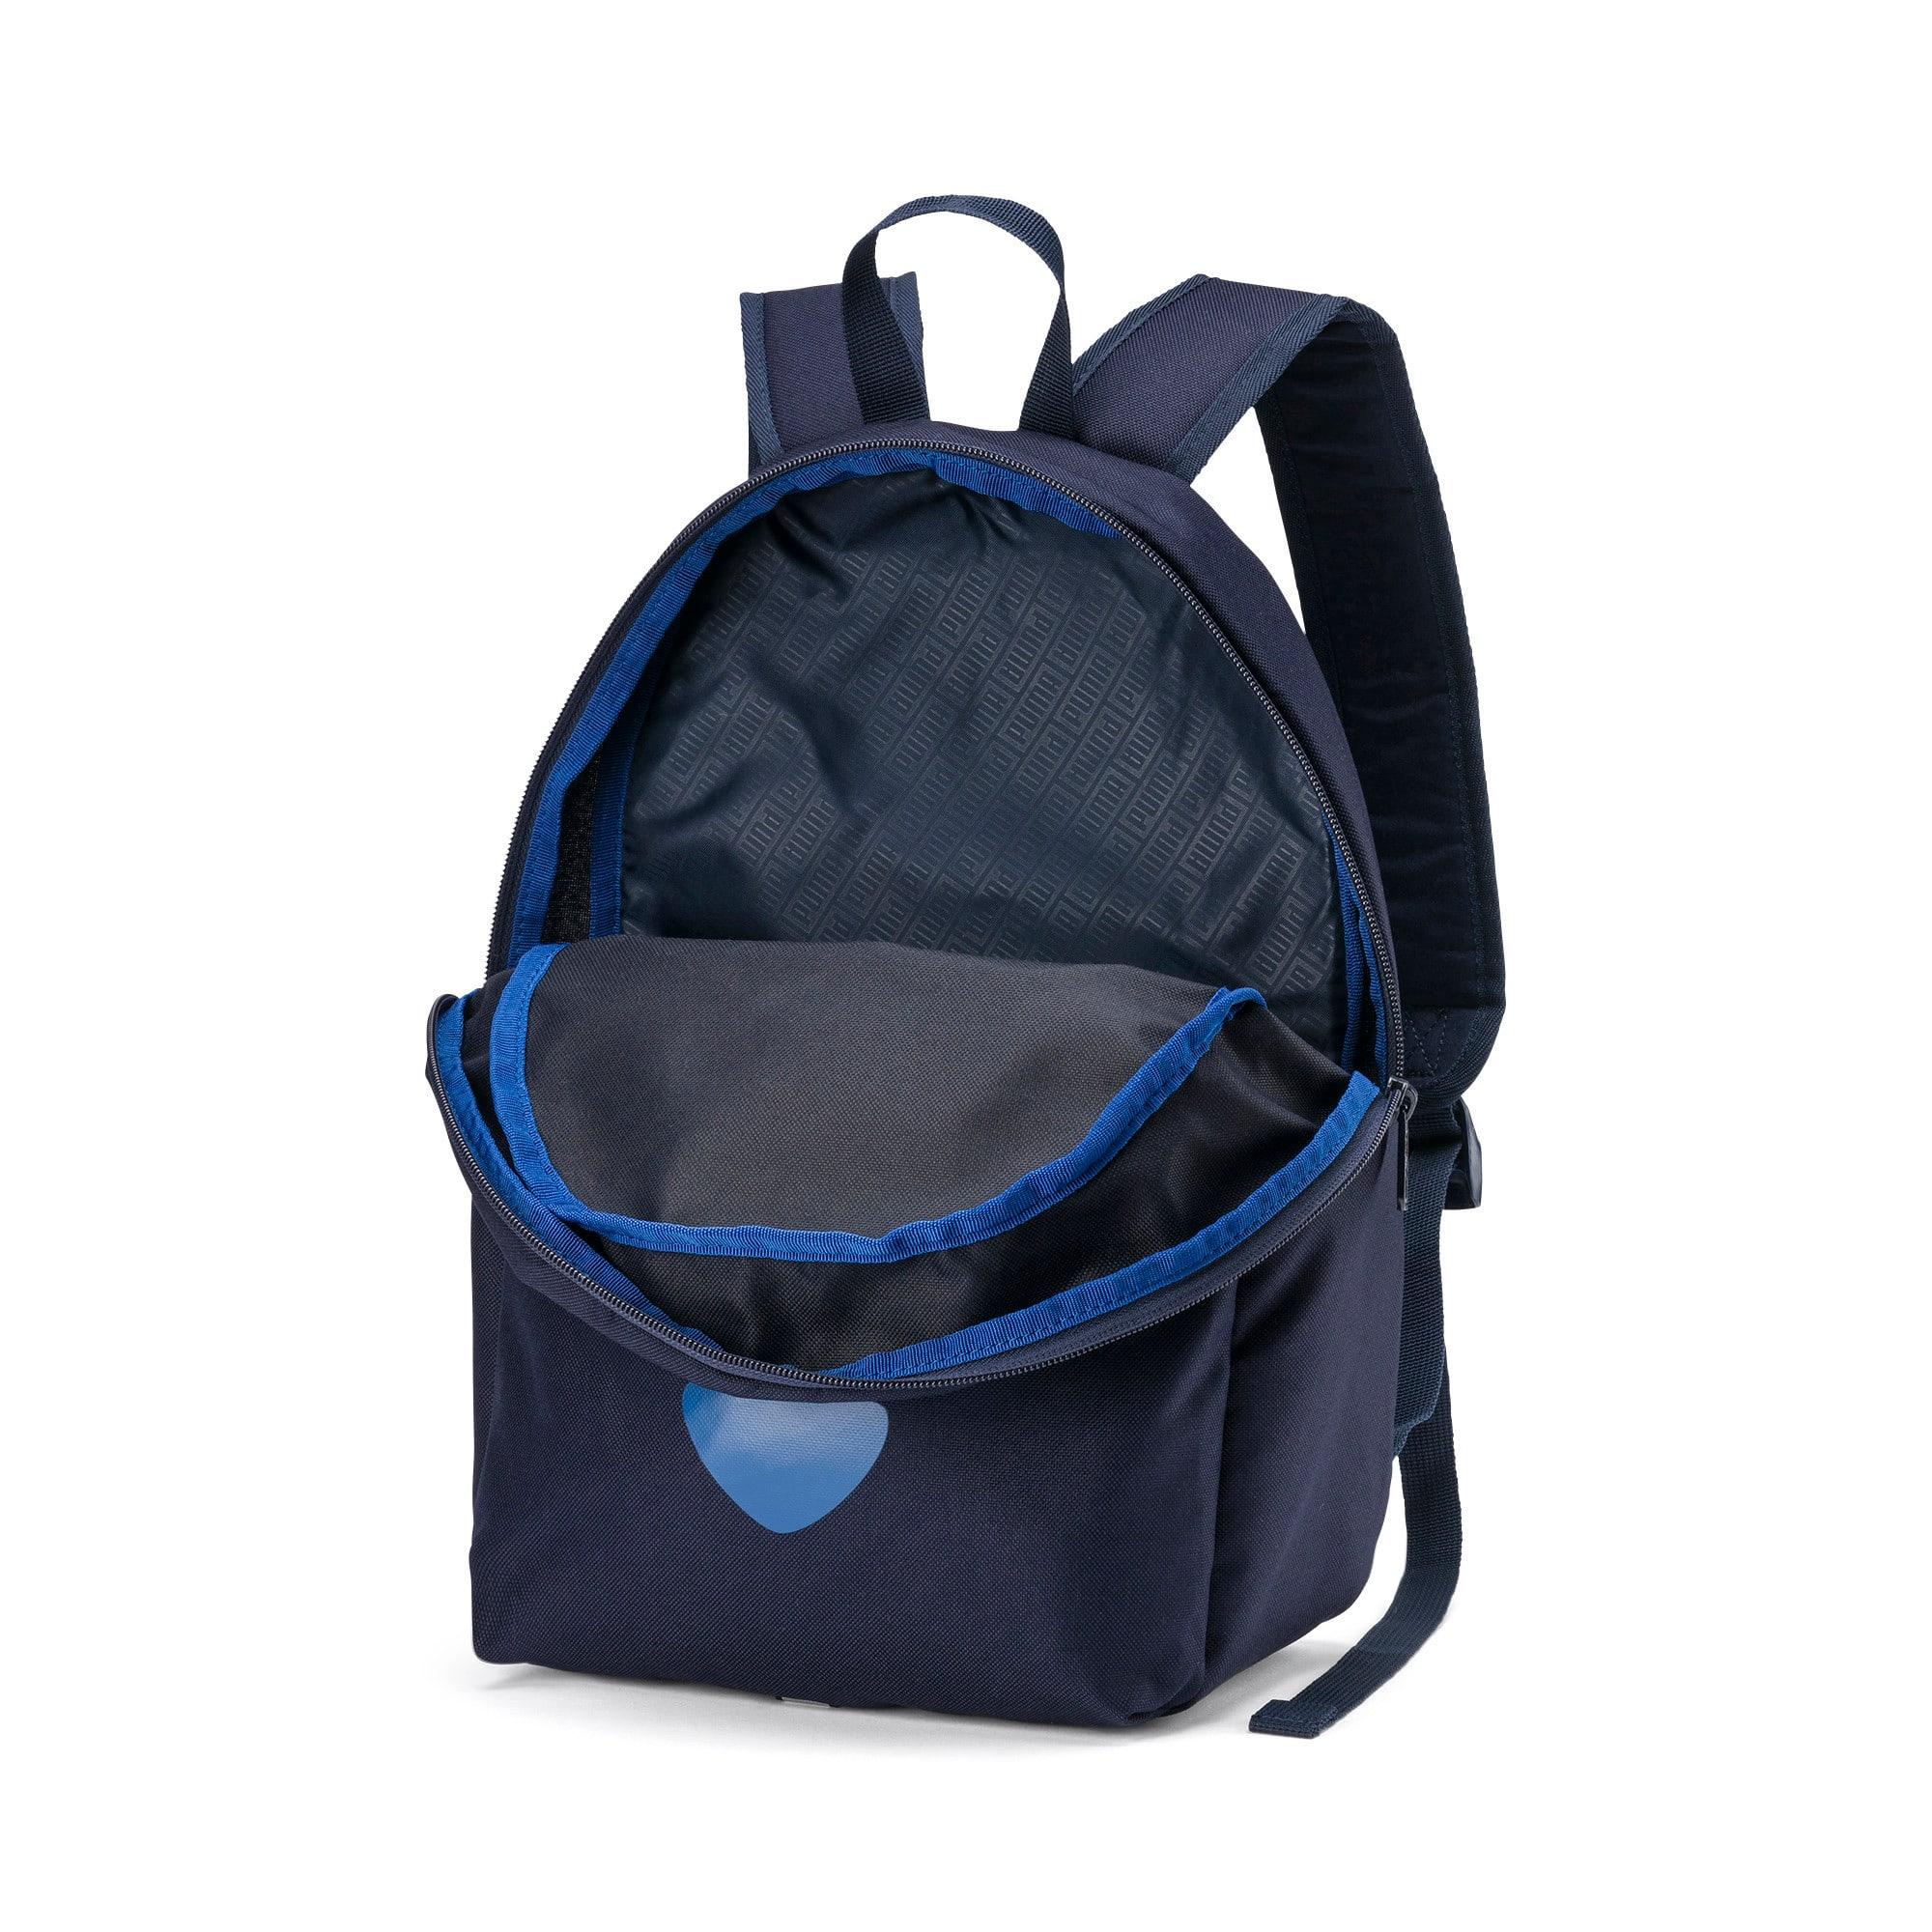 Thumbnail 3 of PUMA Monster Backpack, Peacoat, medium-IND